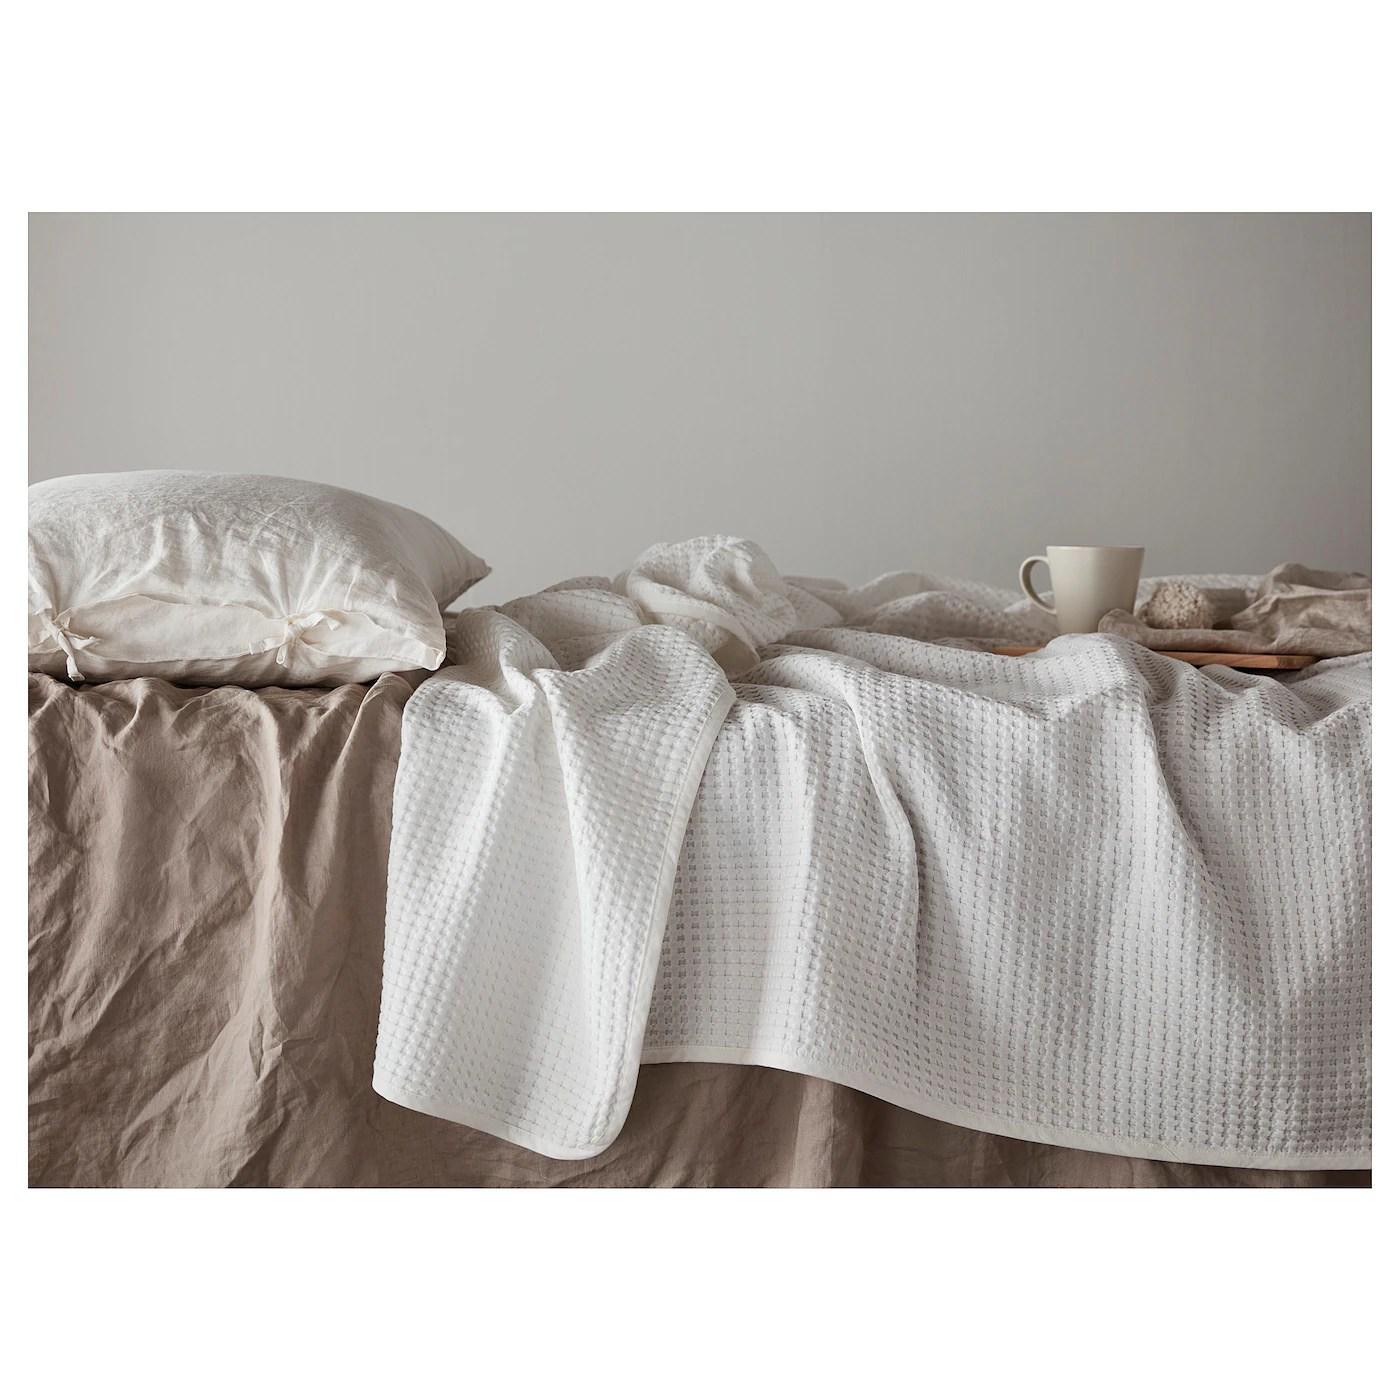 Vareld Couvre Lit Blanc 150x250 Cm Ikea